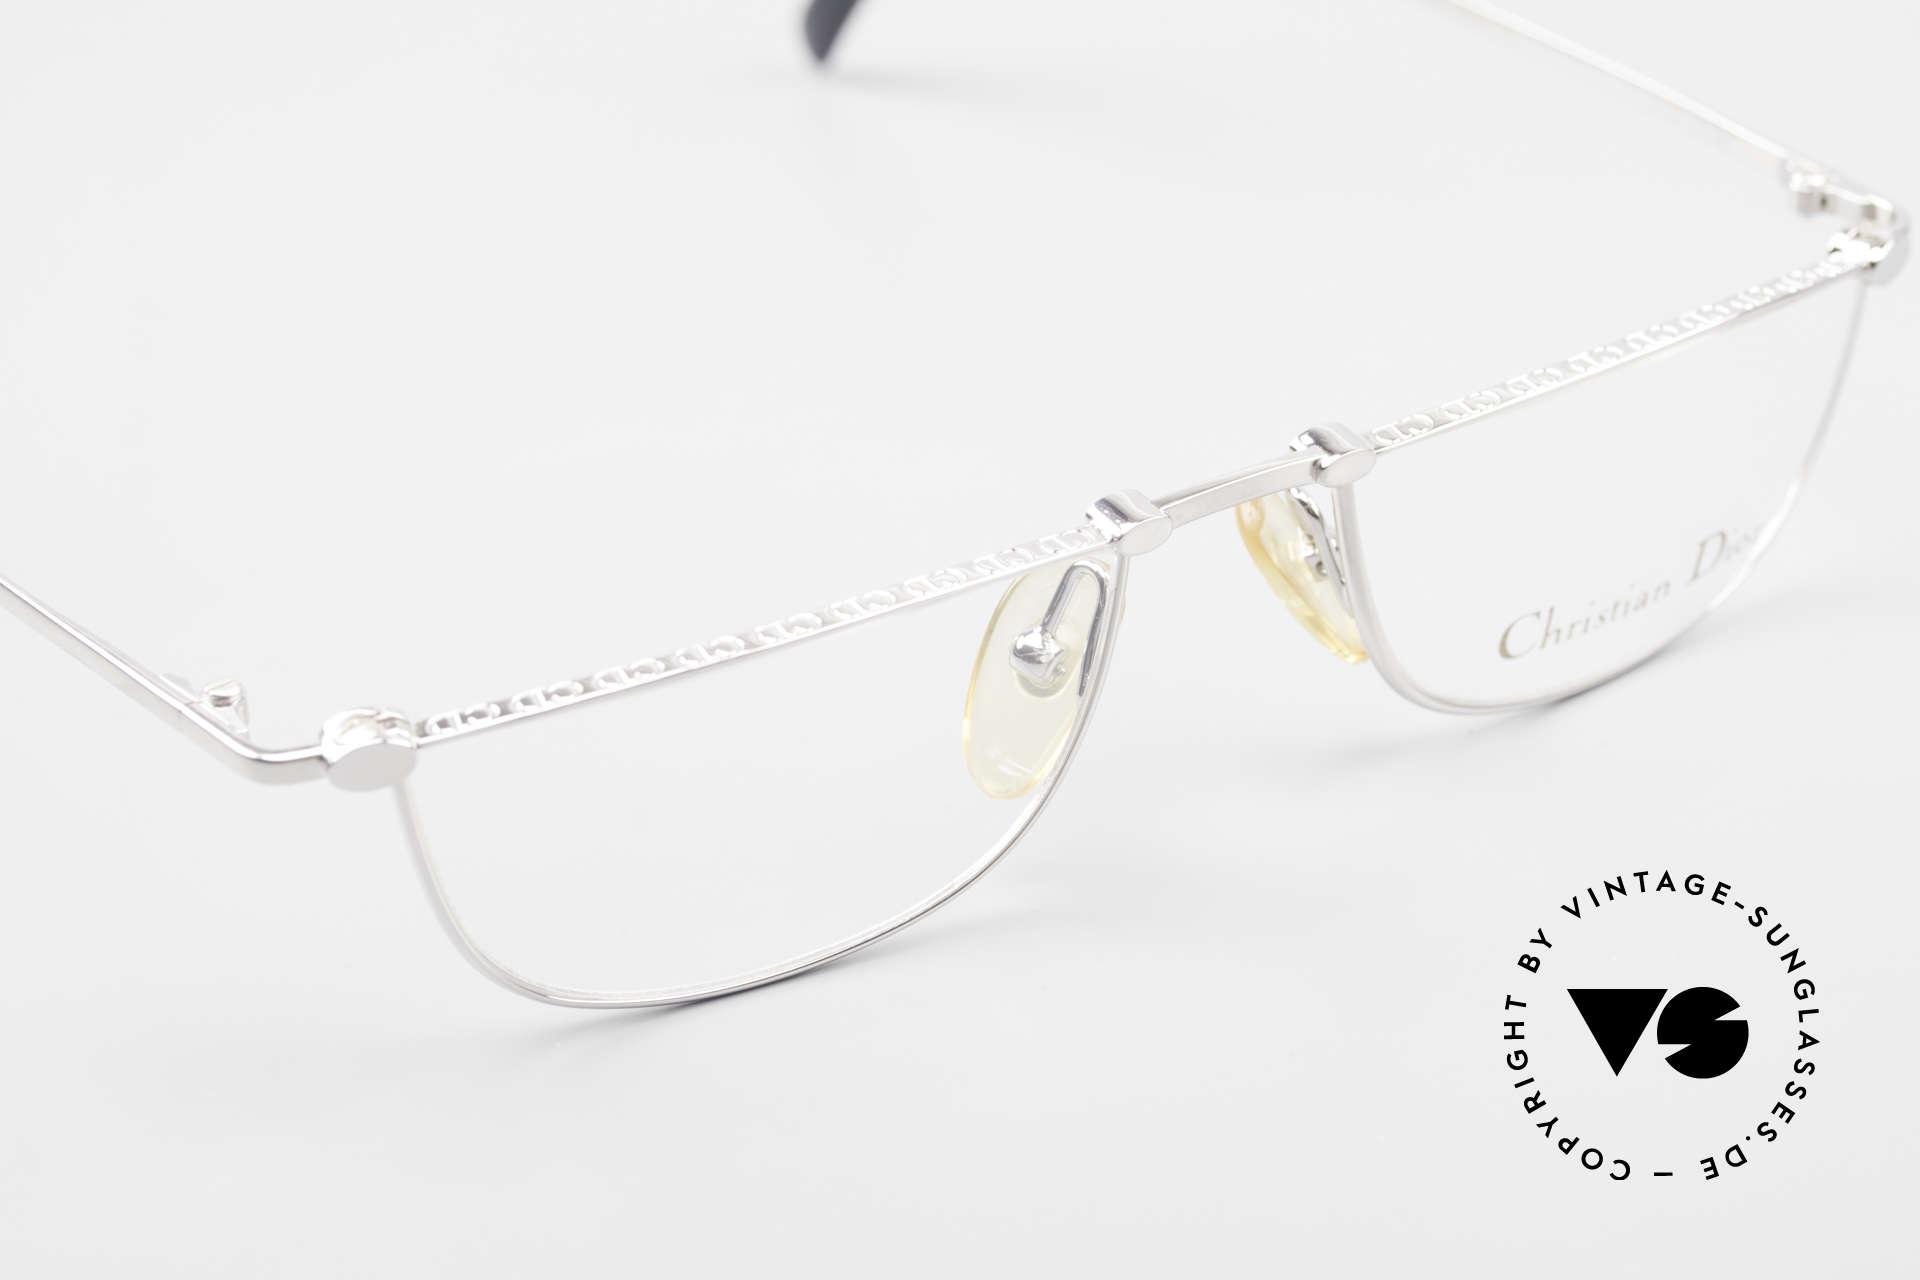 Christian Dior 2943 Designer Reading Glasses 90's, NO RETRO glasses, but a rare 30 years old ORIGINAL, Made for Men and Women